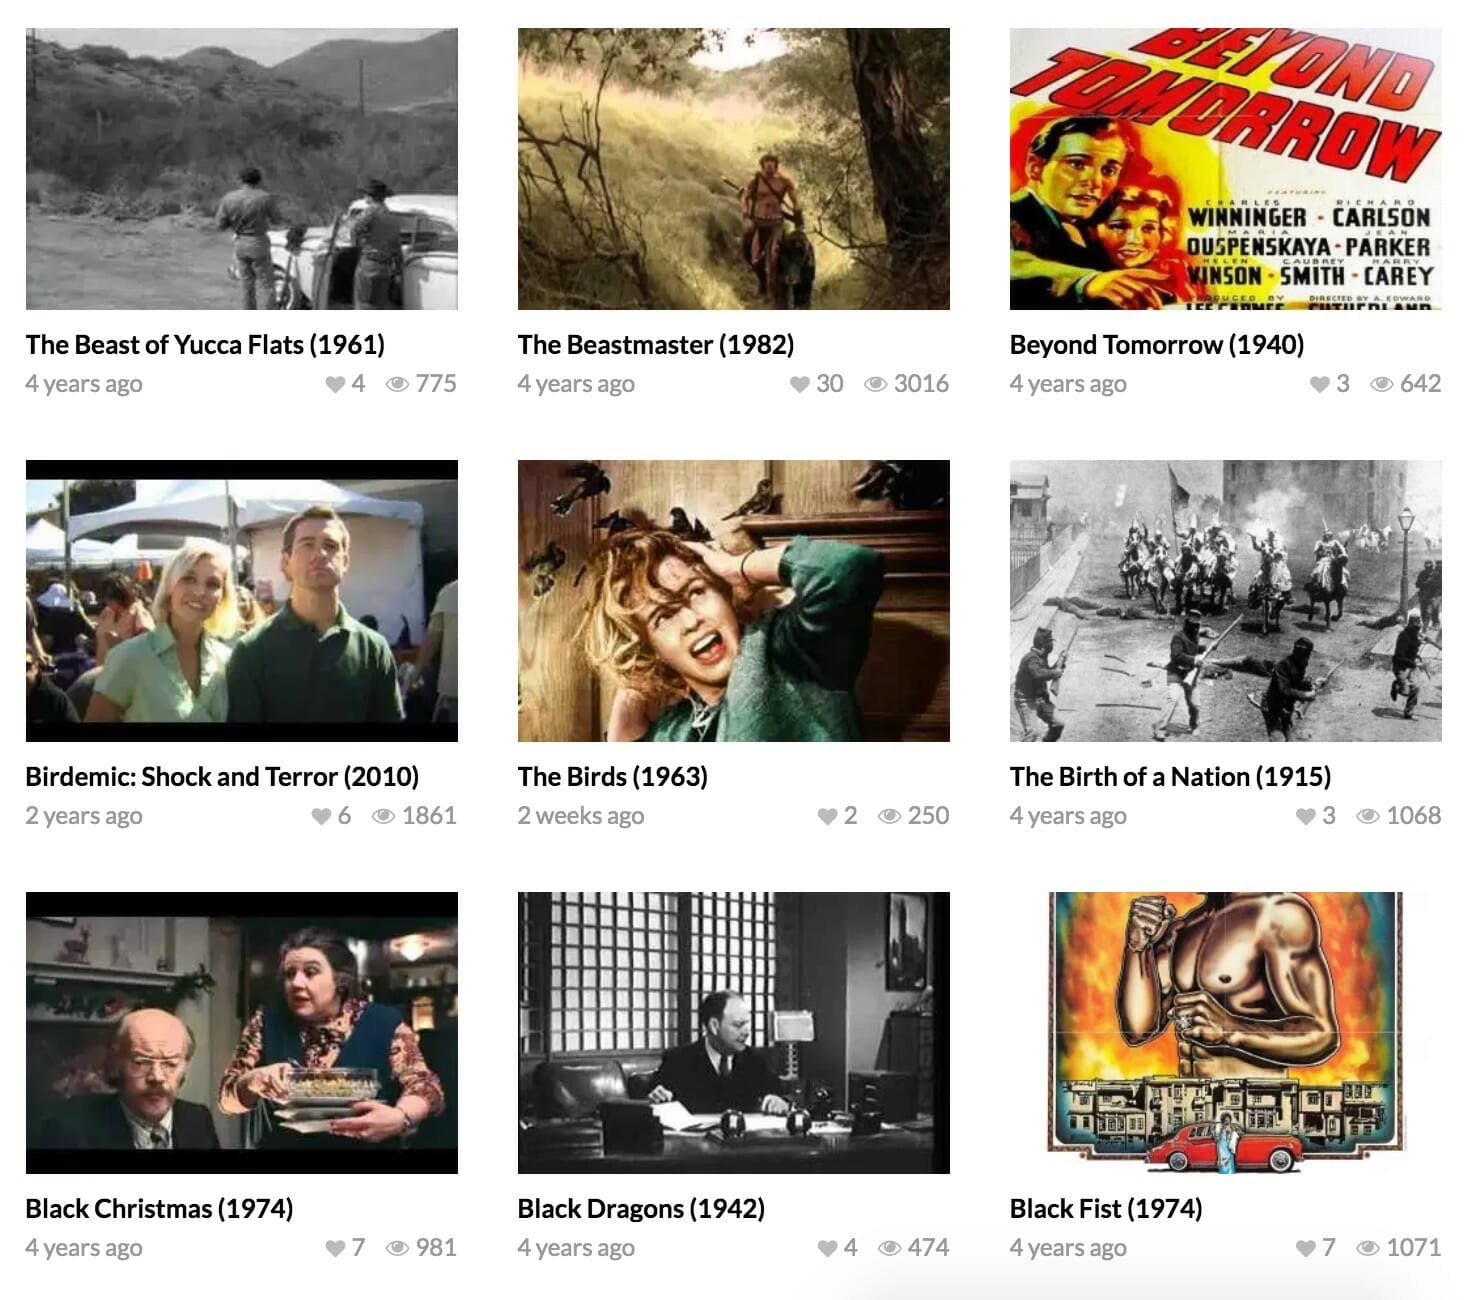 youtube free movies - foundmoviesonline